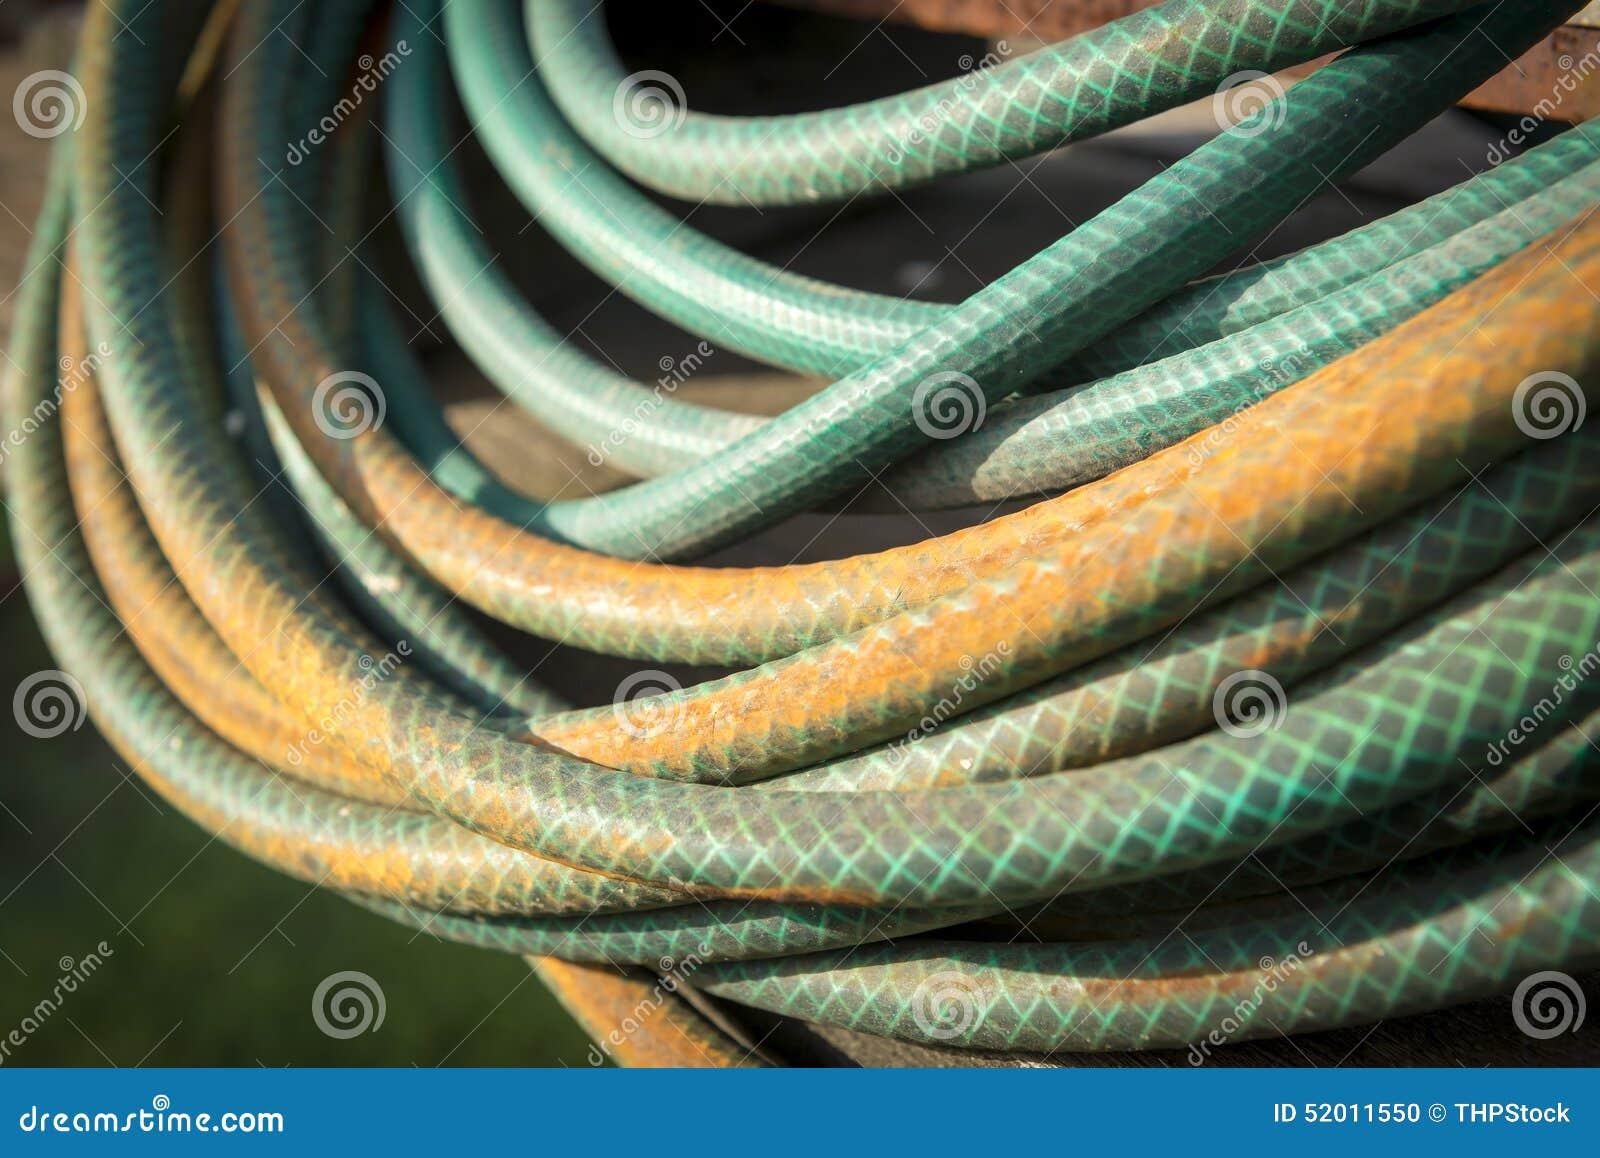 De slang van de tuin